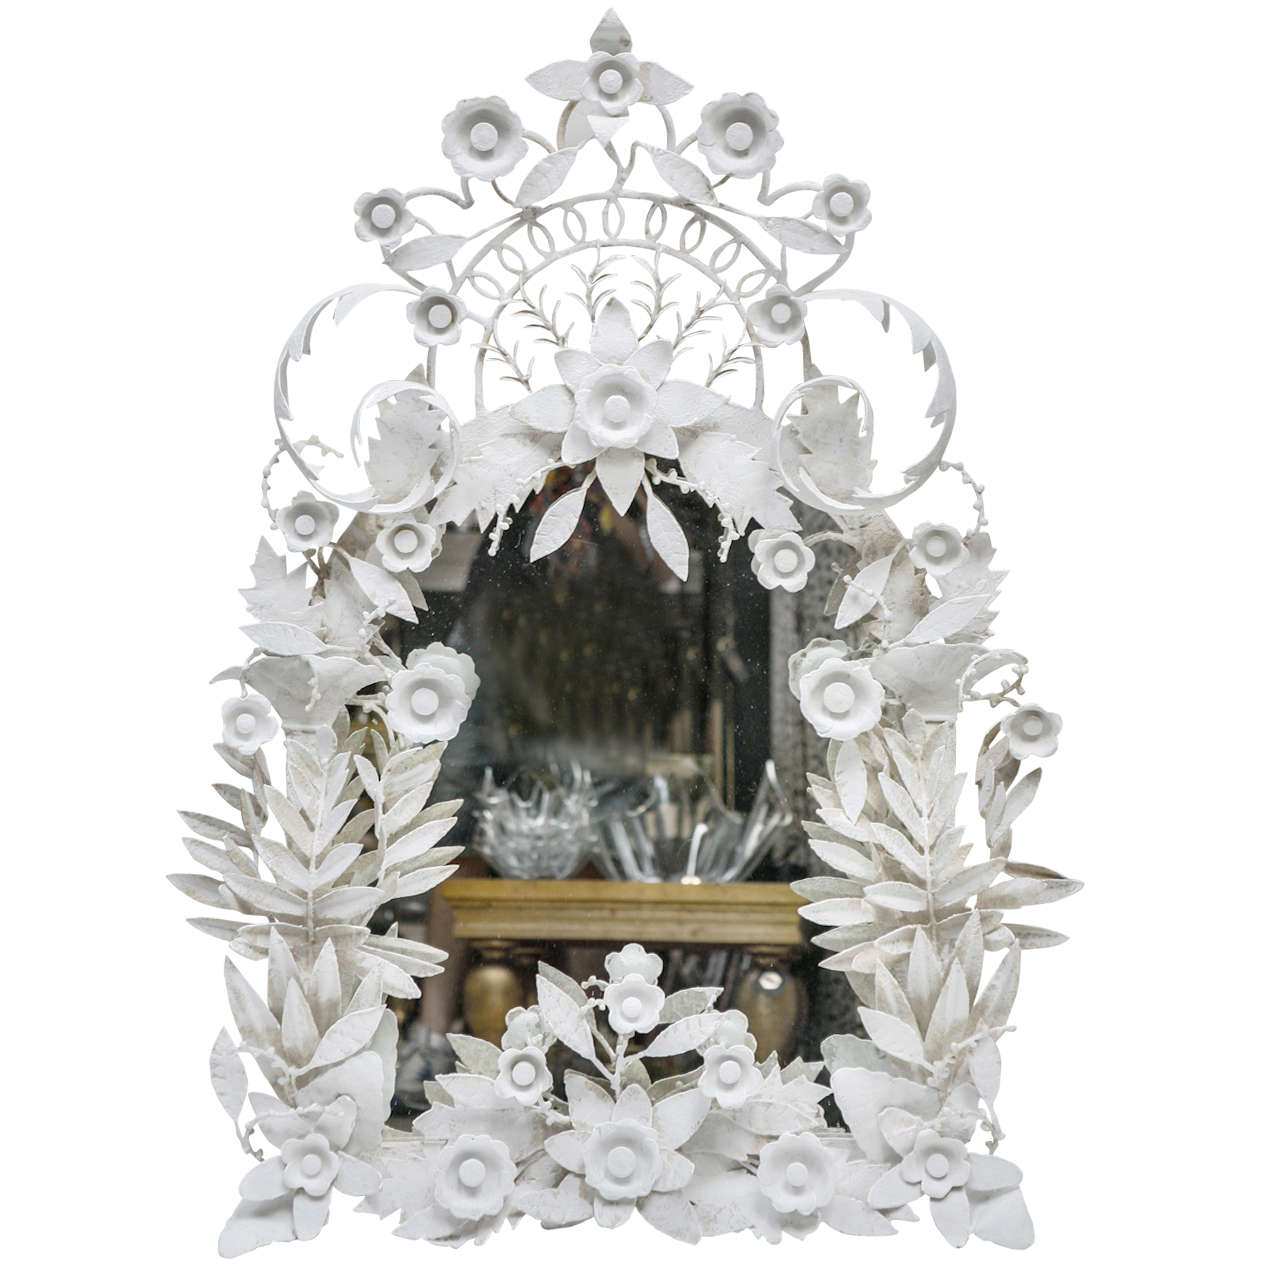 Italian rococo style white plaster mirror at 1stdibs for White baroque style mirror